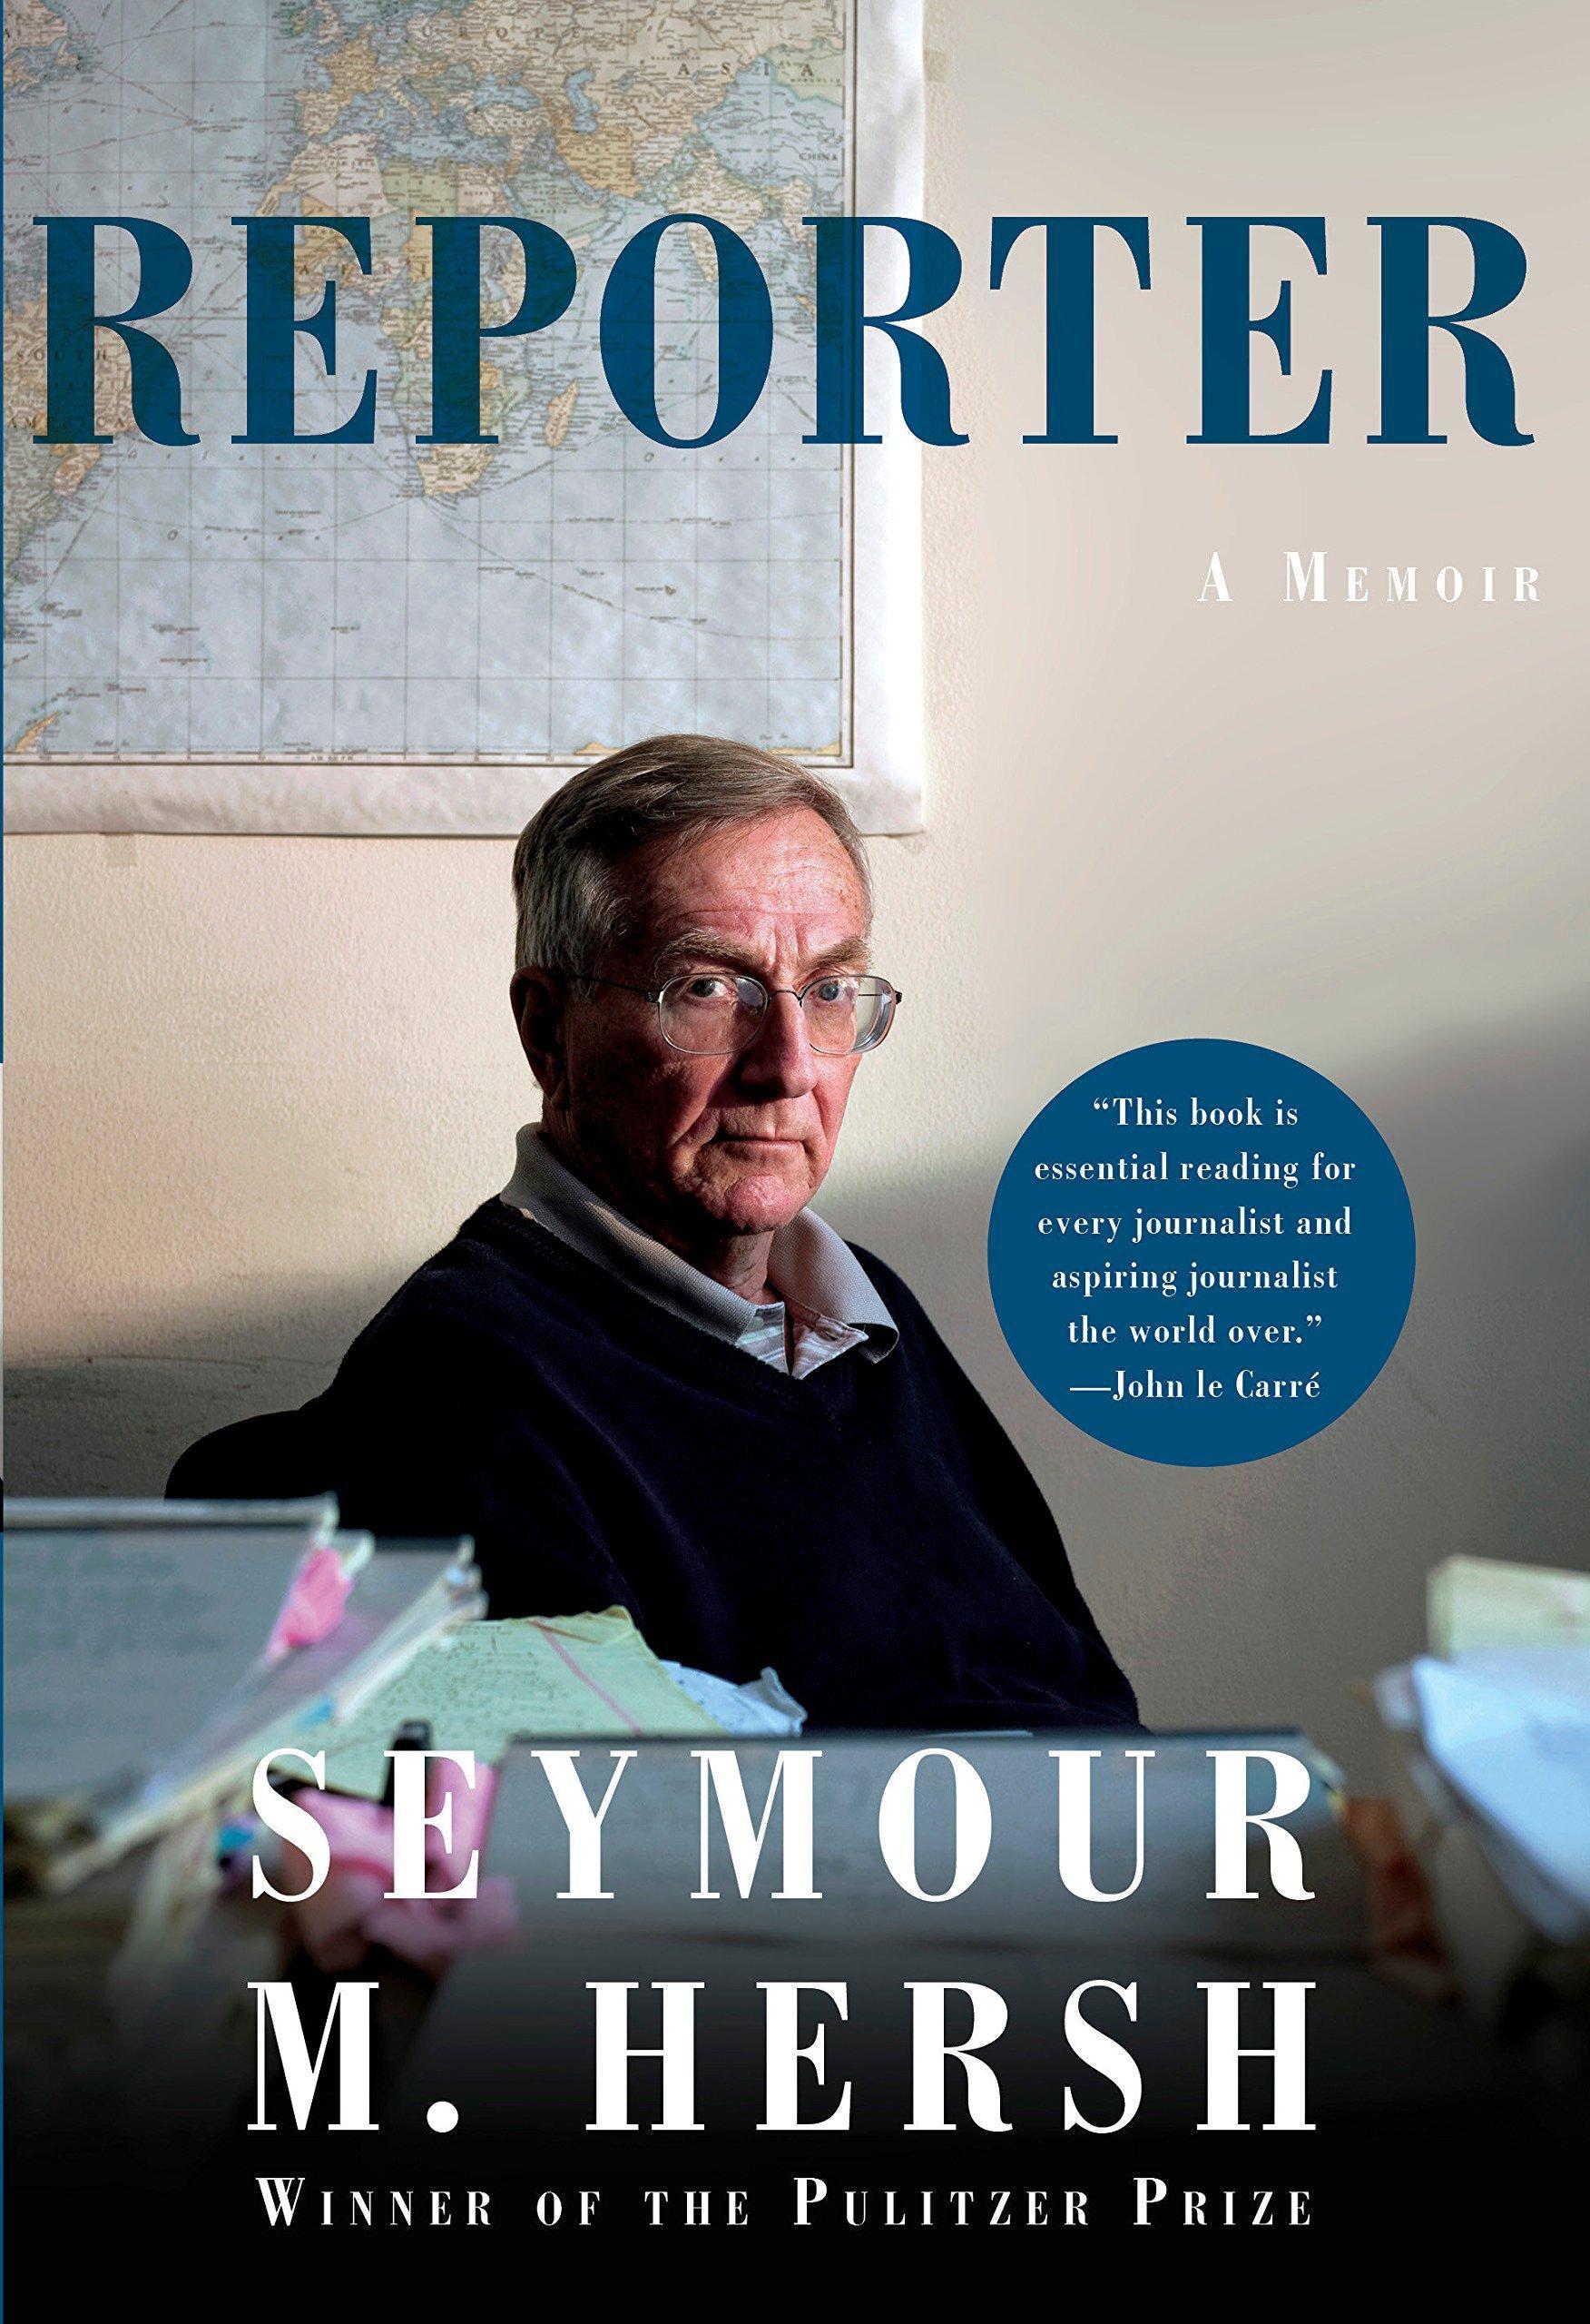 seymourhersh-reporter